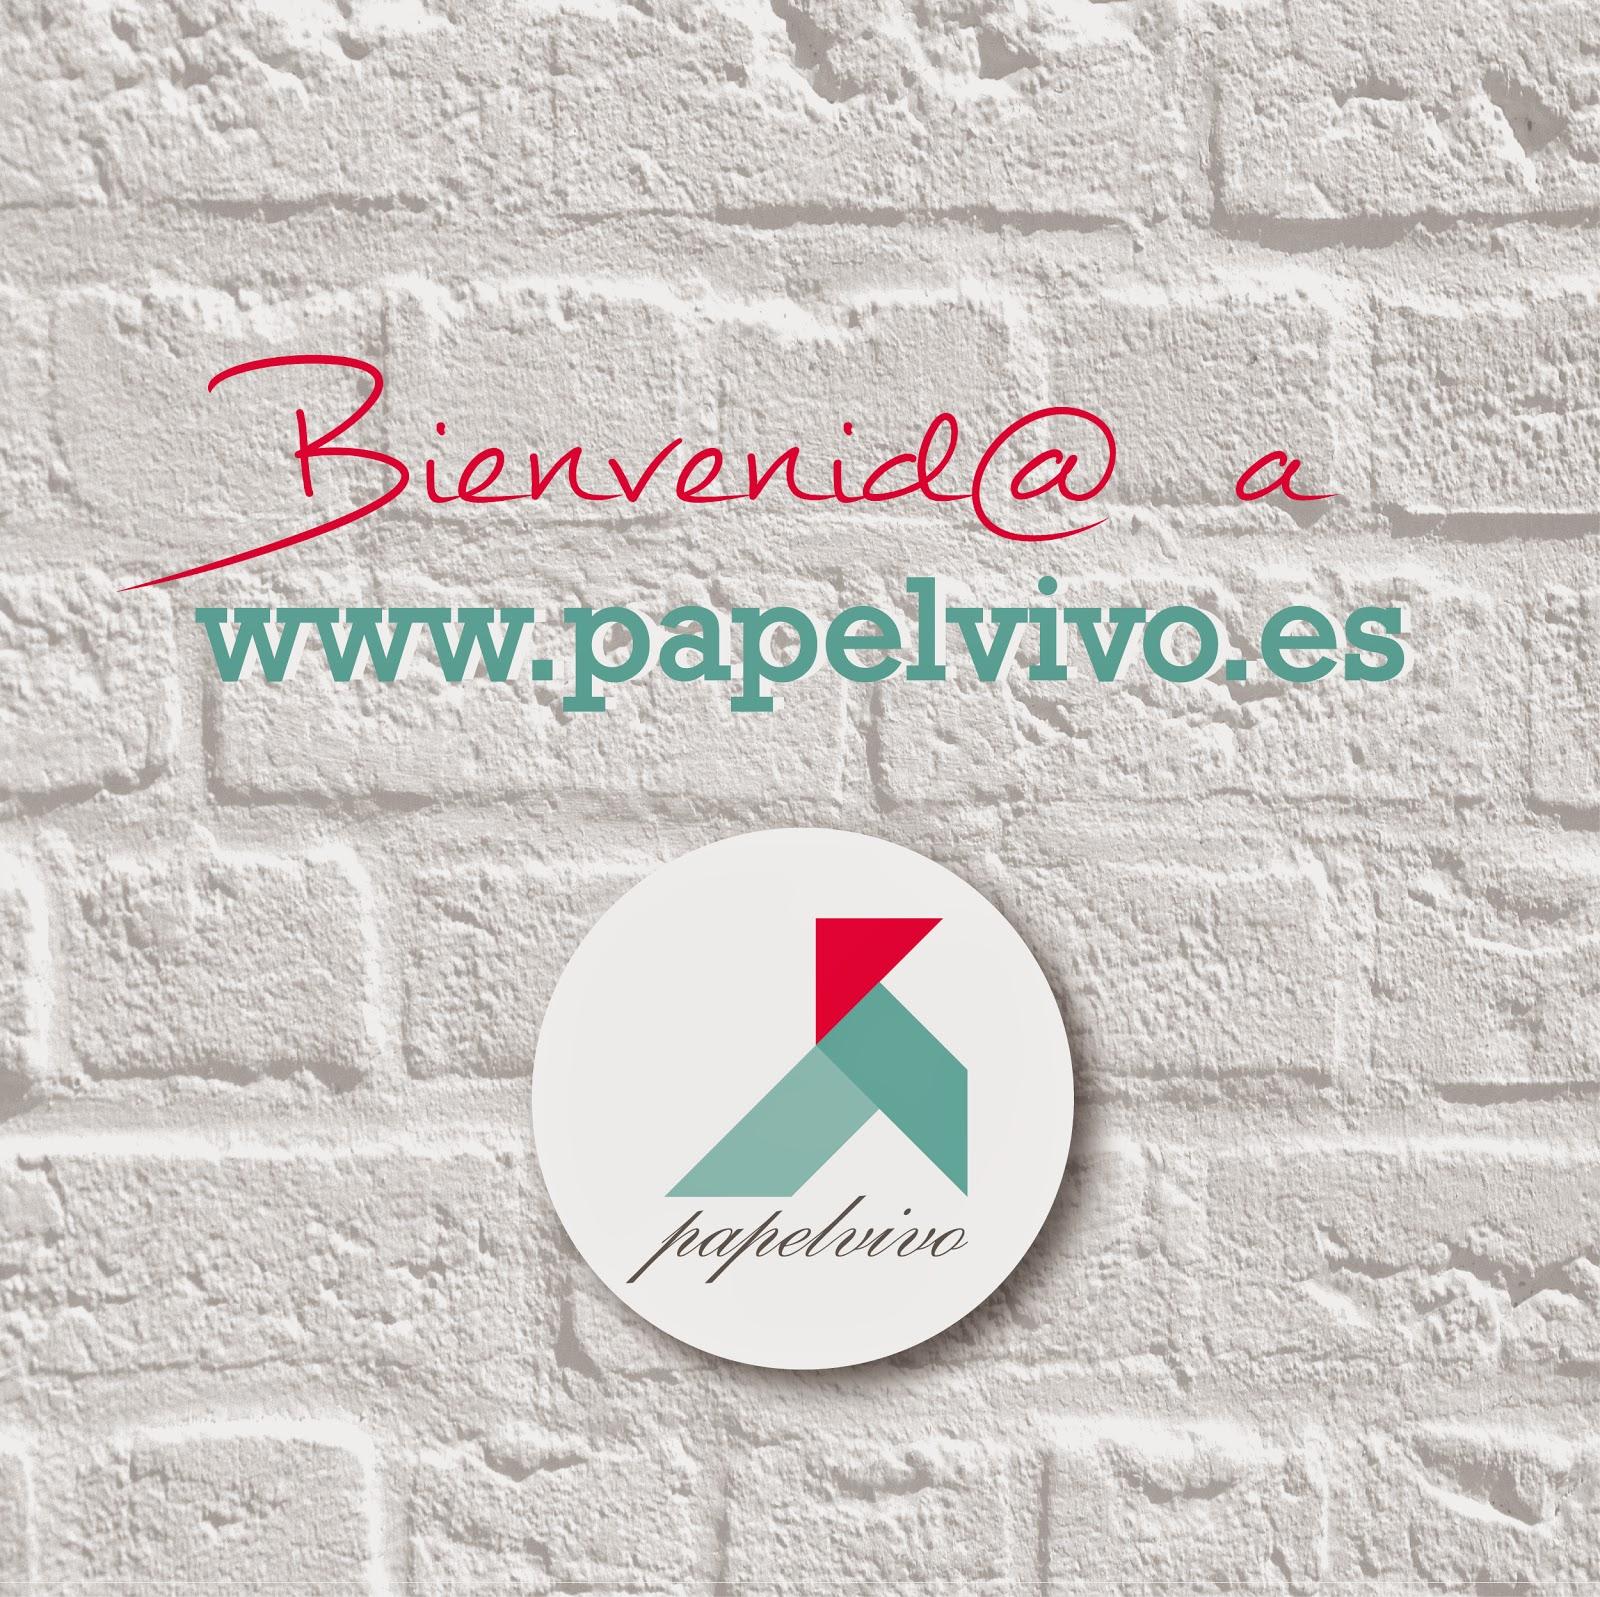 www.papelvivo.es